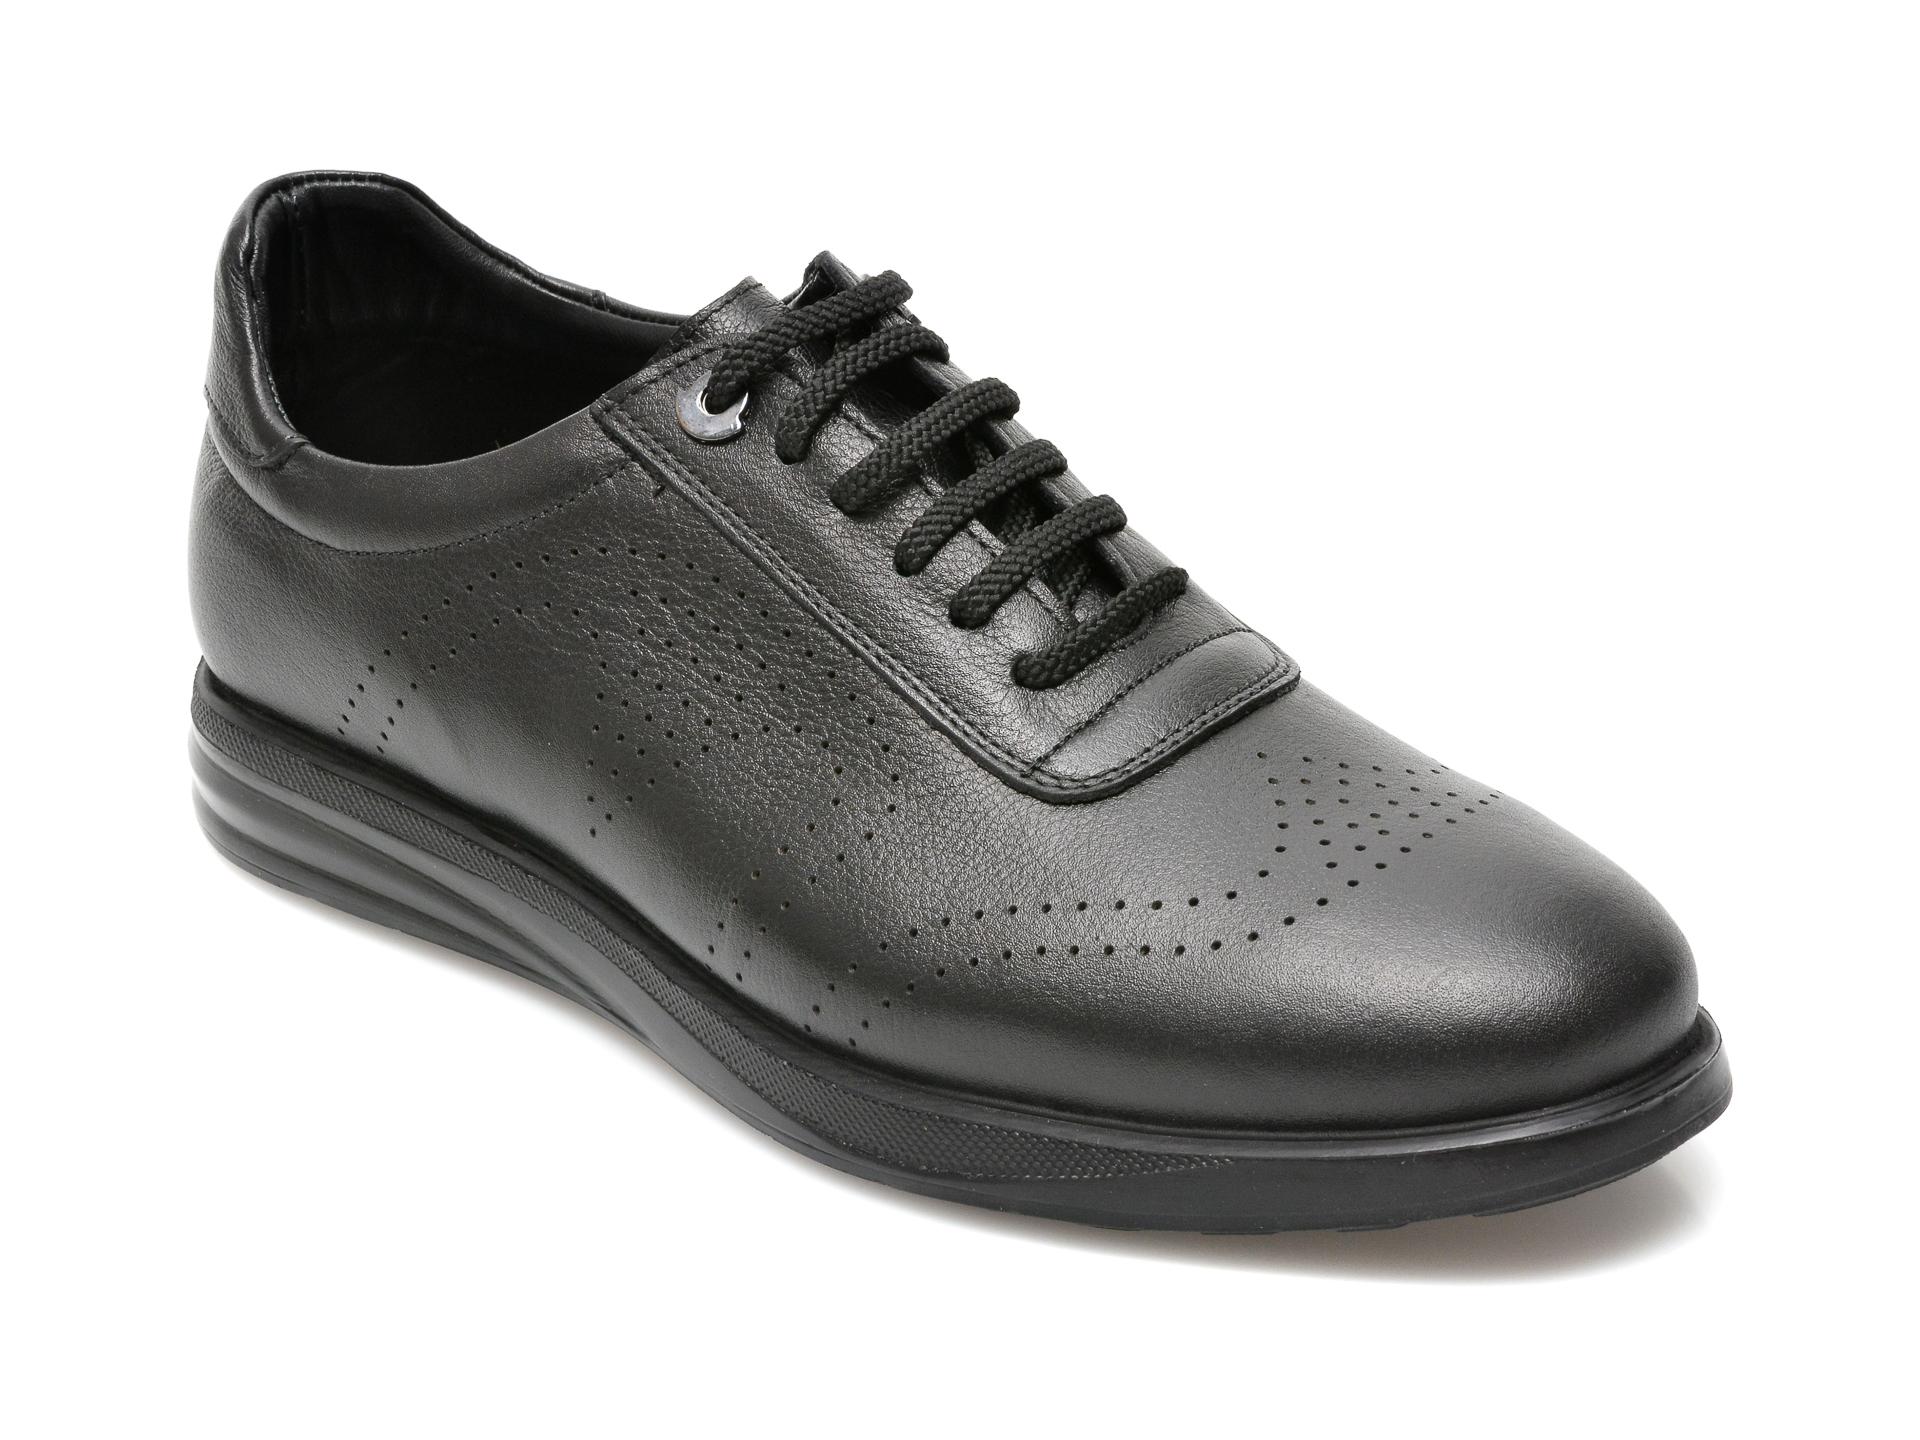 Pantofi OTTER negri, E881, din piele naturala imagine